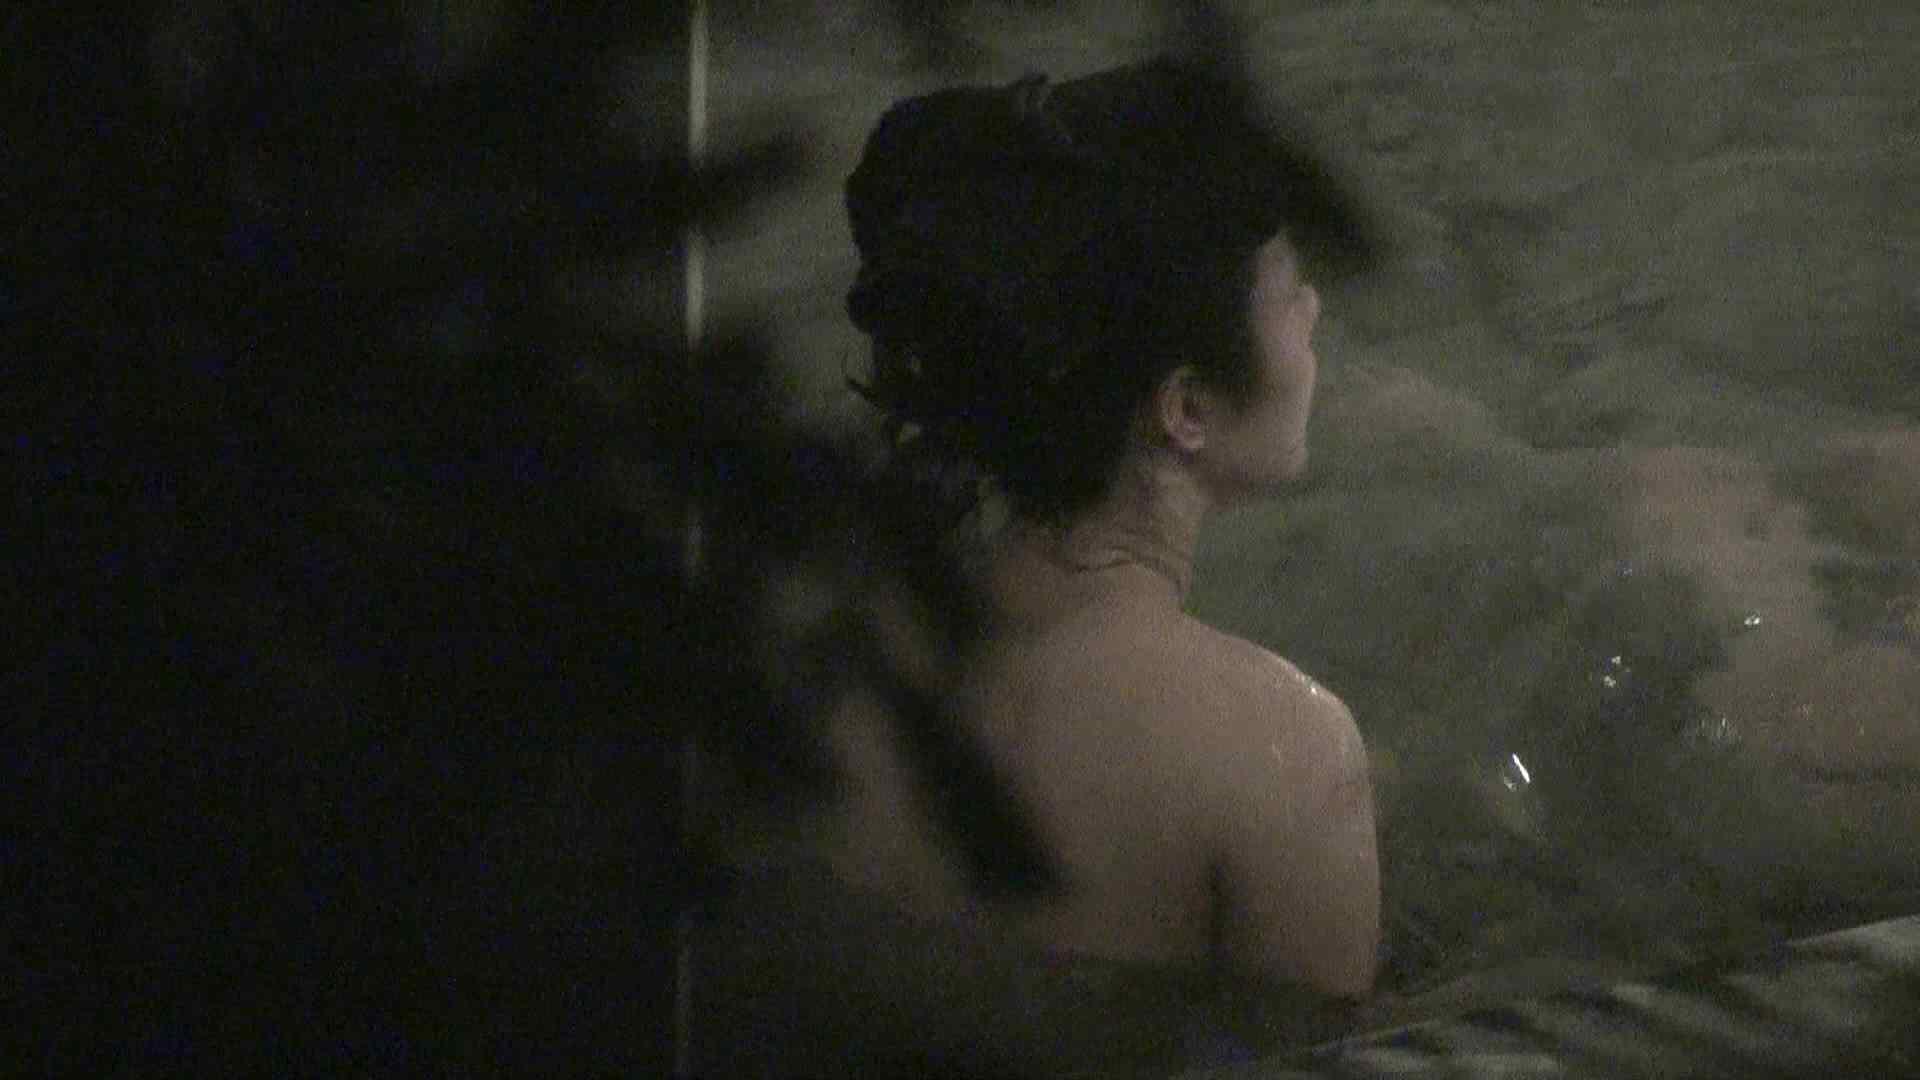 Aquaな露天風呂Vol.315 0 | 0  66連発 63